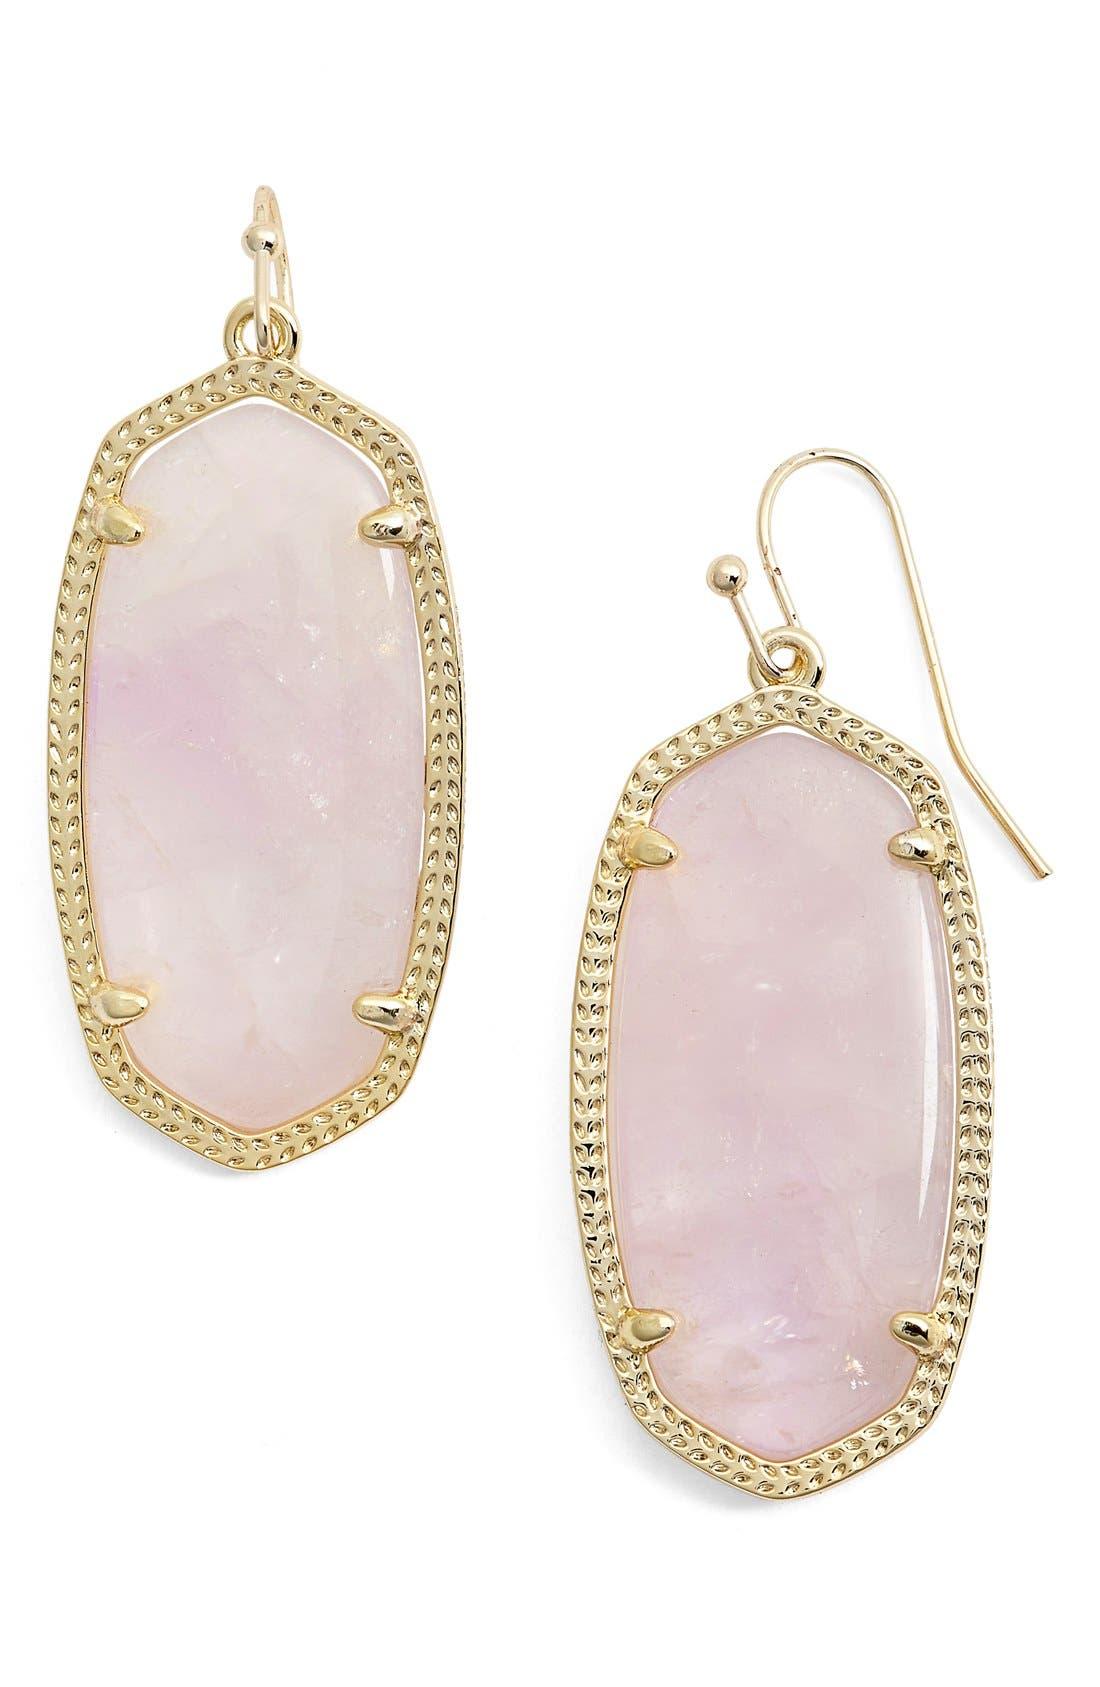 Alternate Image 1 Selected - Kendra Scott 'Elle' Drop Earrings